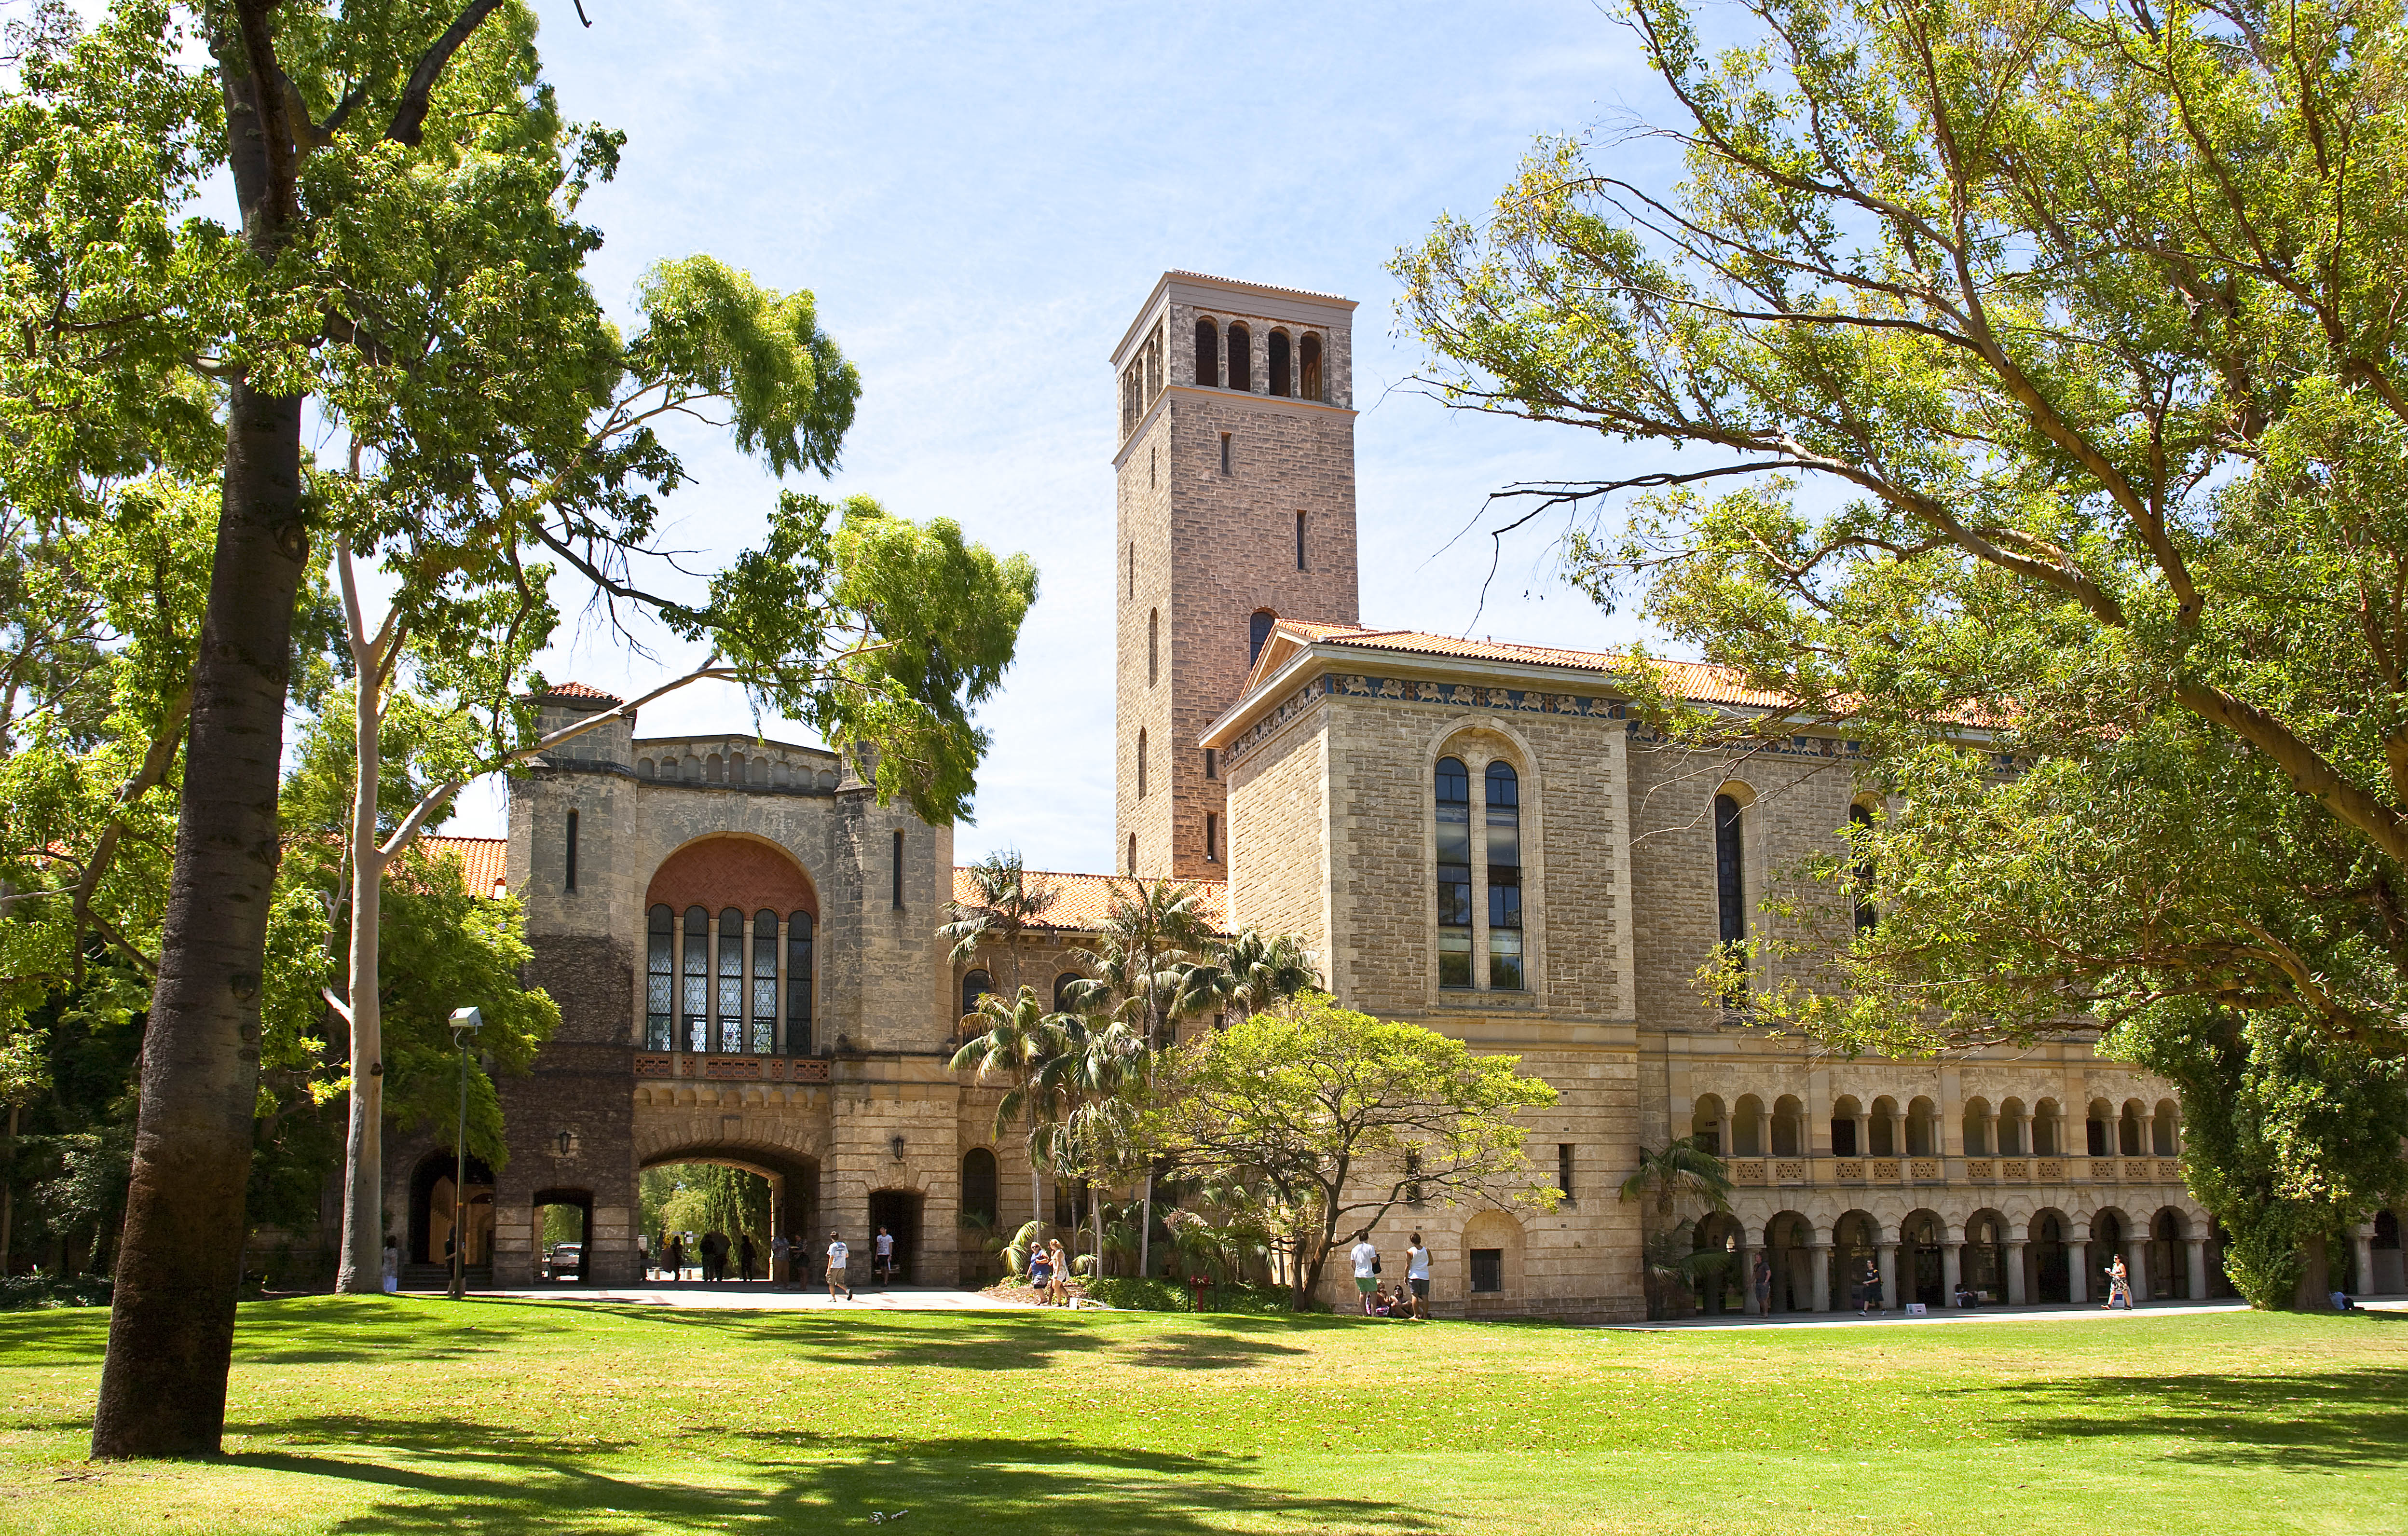 University of Western Australia - most beautiful universities in Australia